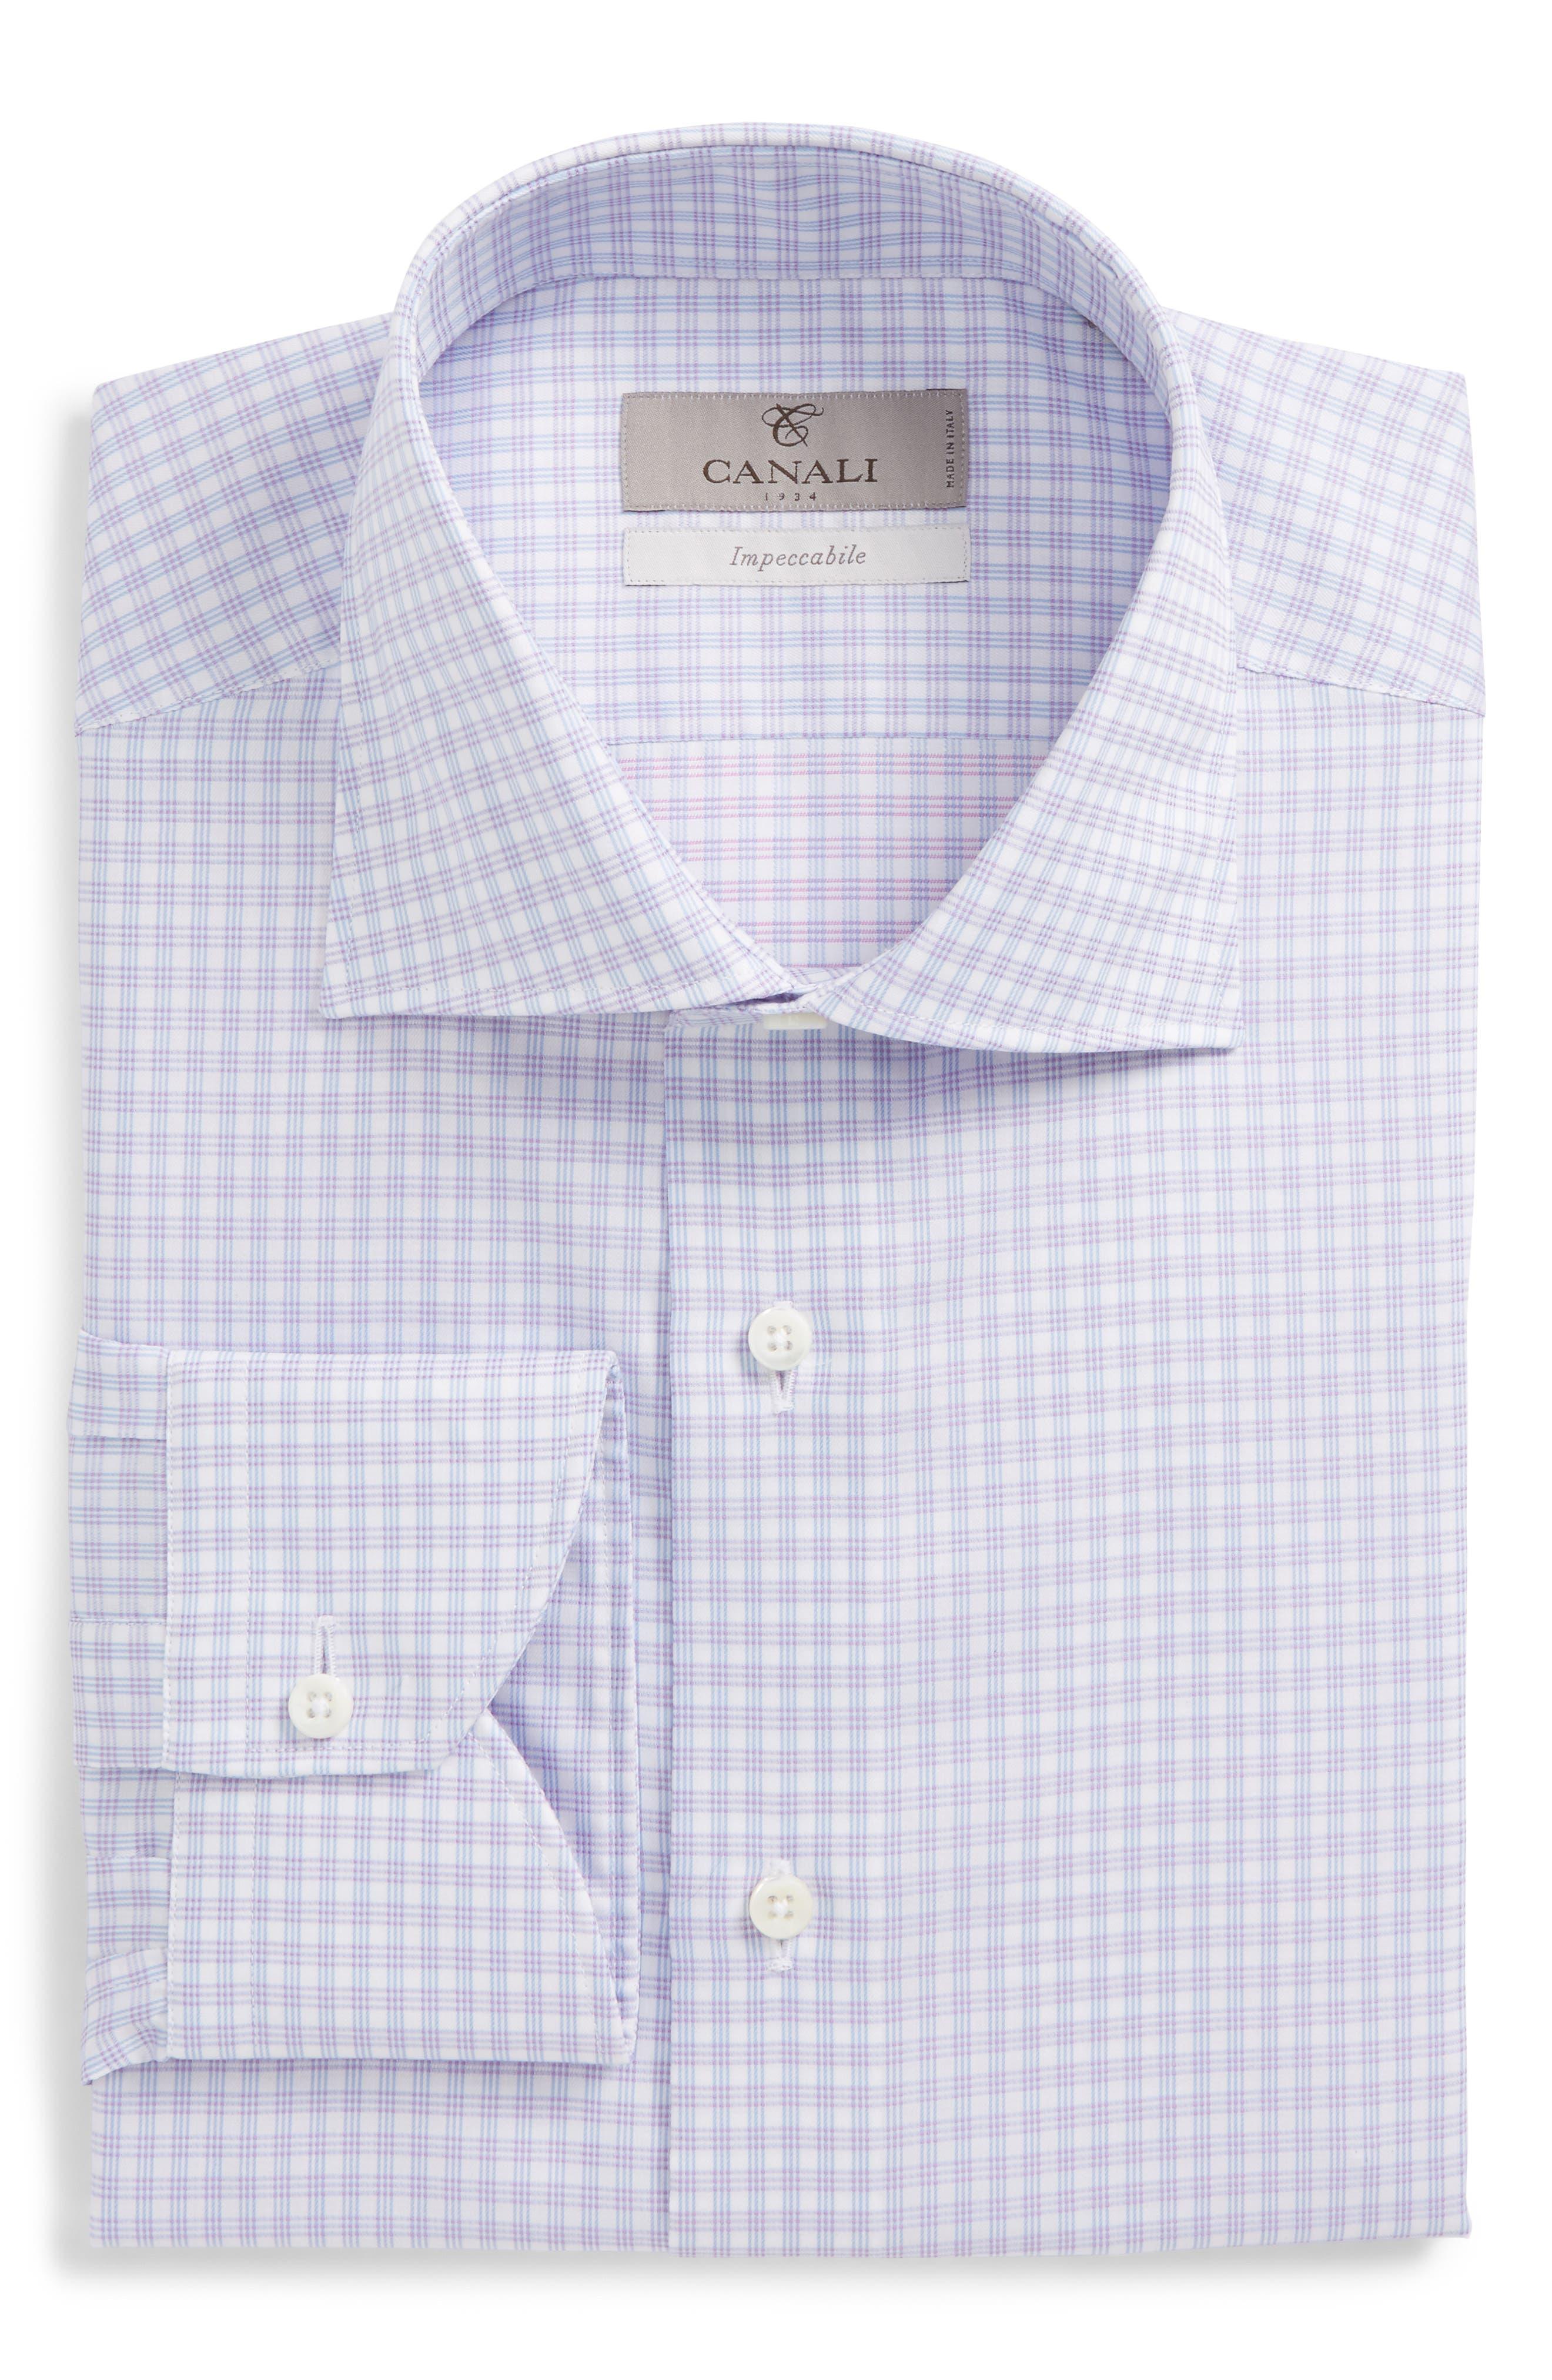 Regular Fit Check Dress Shirt,                         Main,                         color, 500